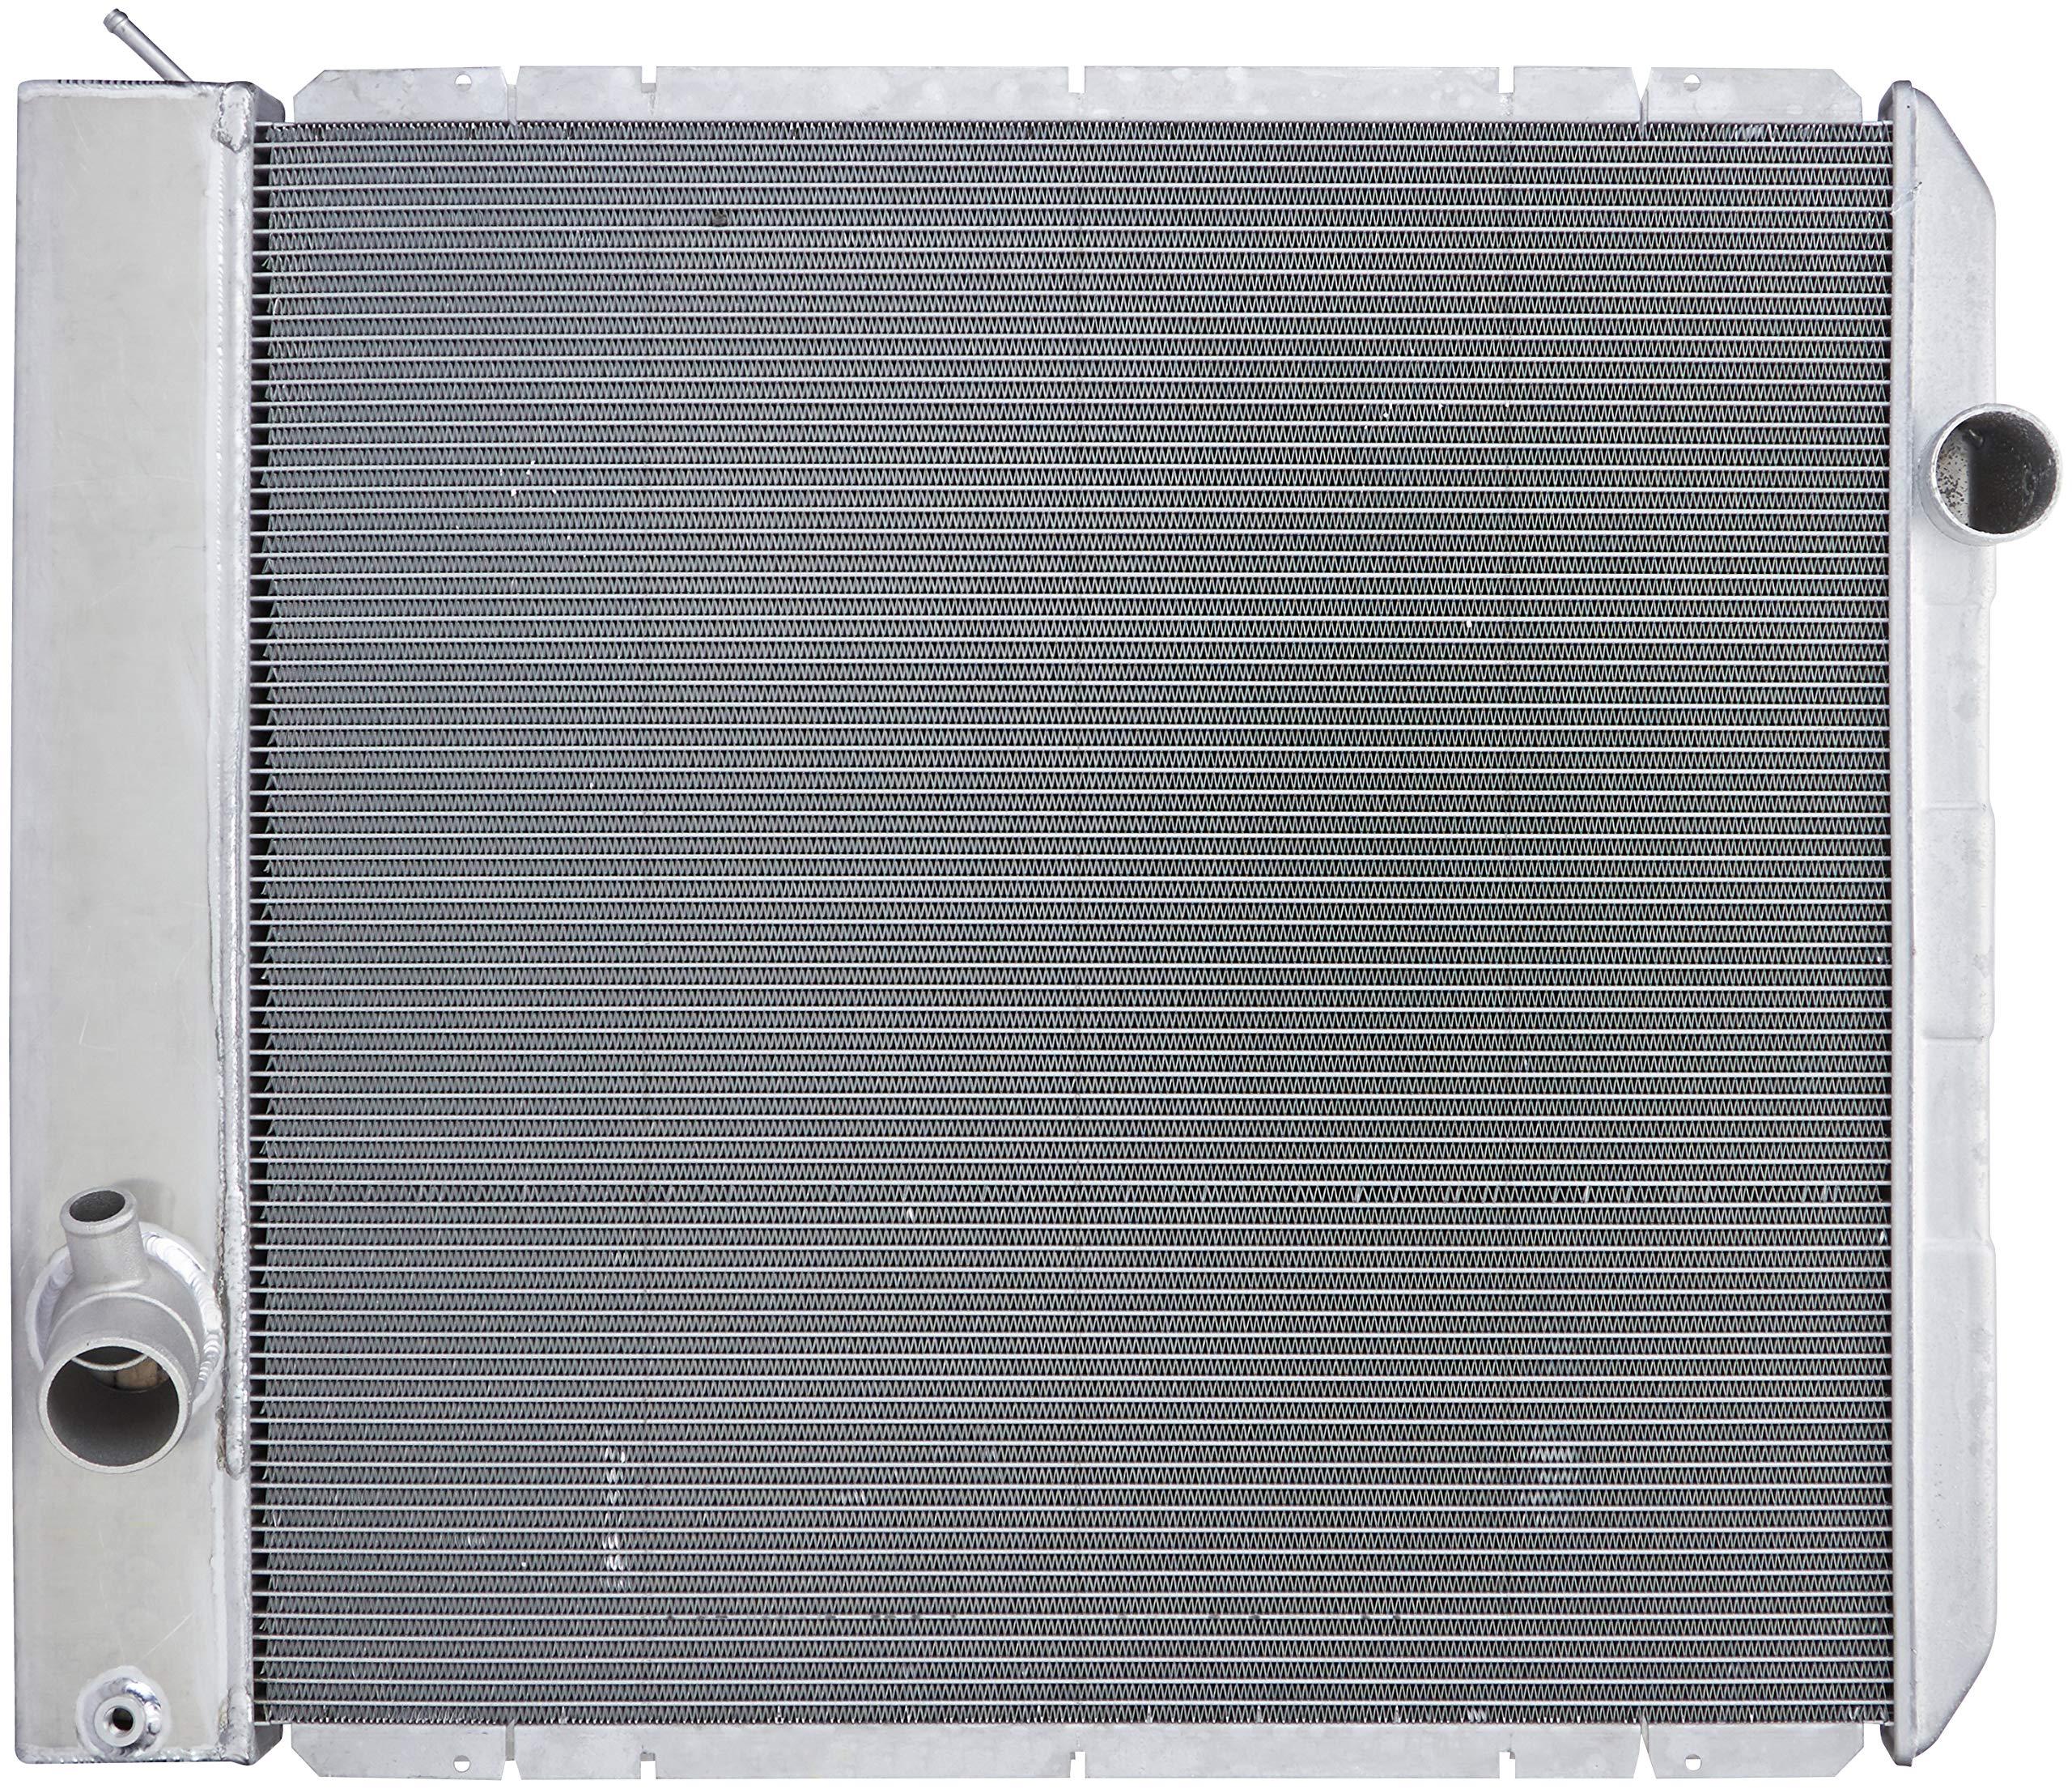 Spectra Premium 2001-3551 Industrial Complete Radiator by Spectra Premium